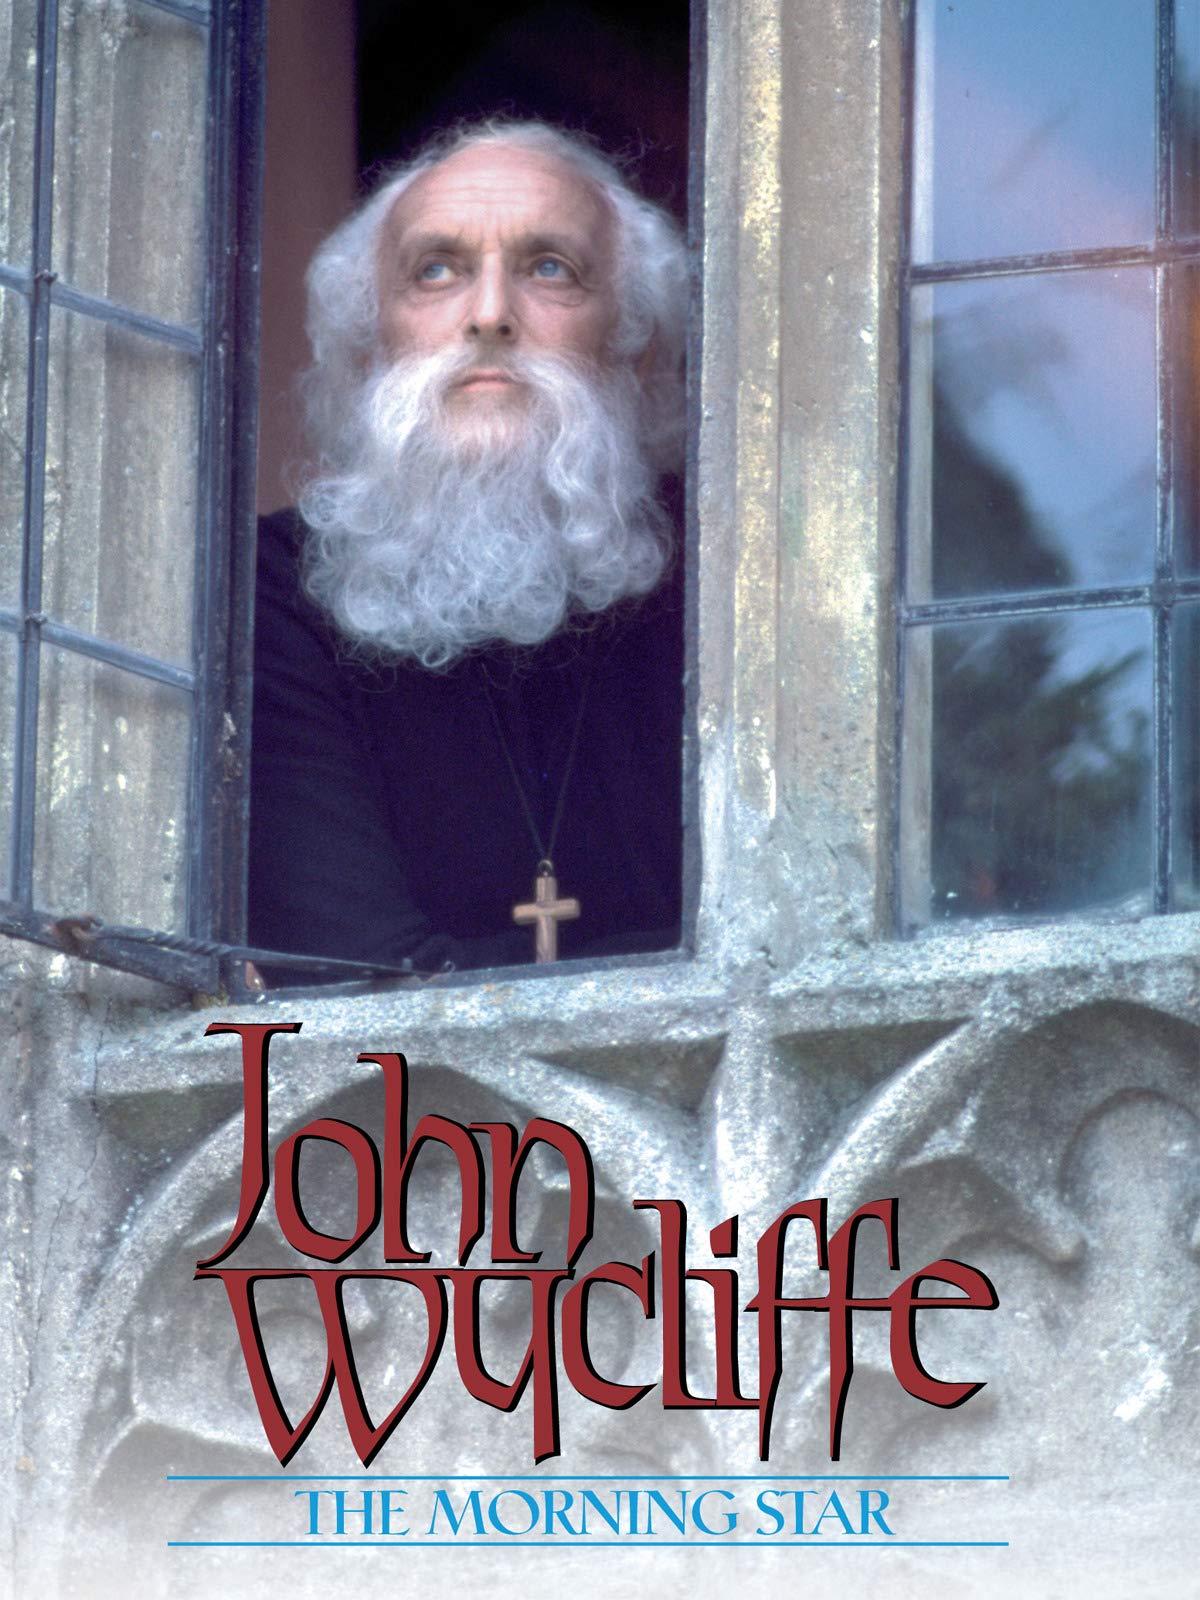 John Wycliffe - The Morning Star